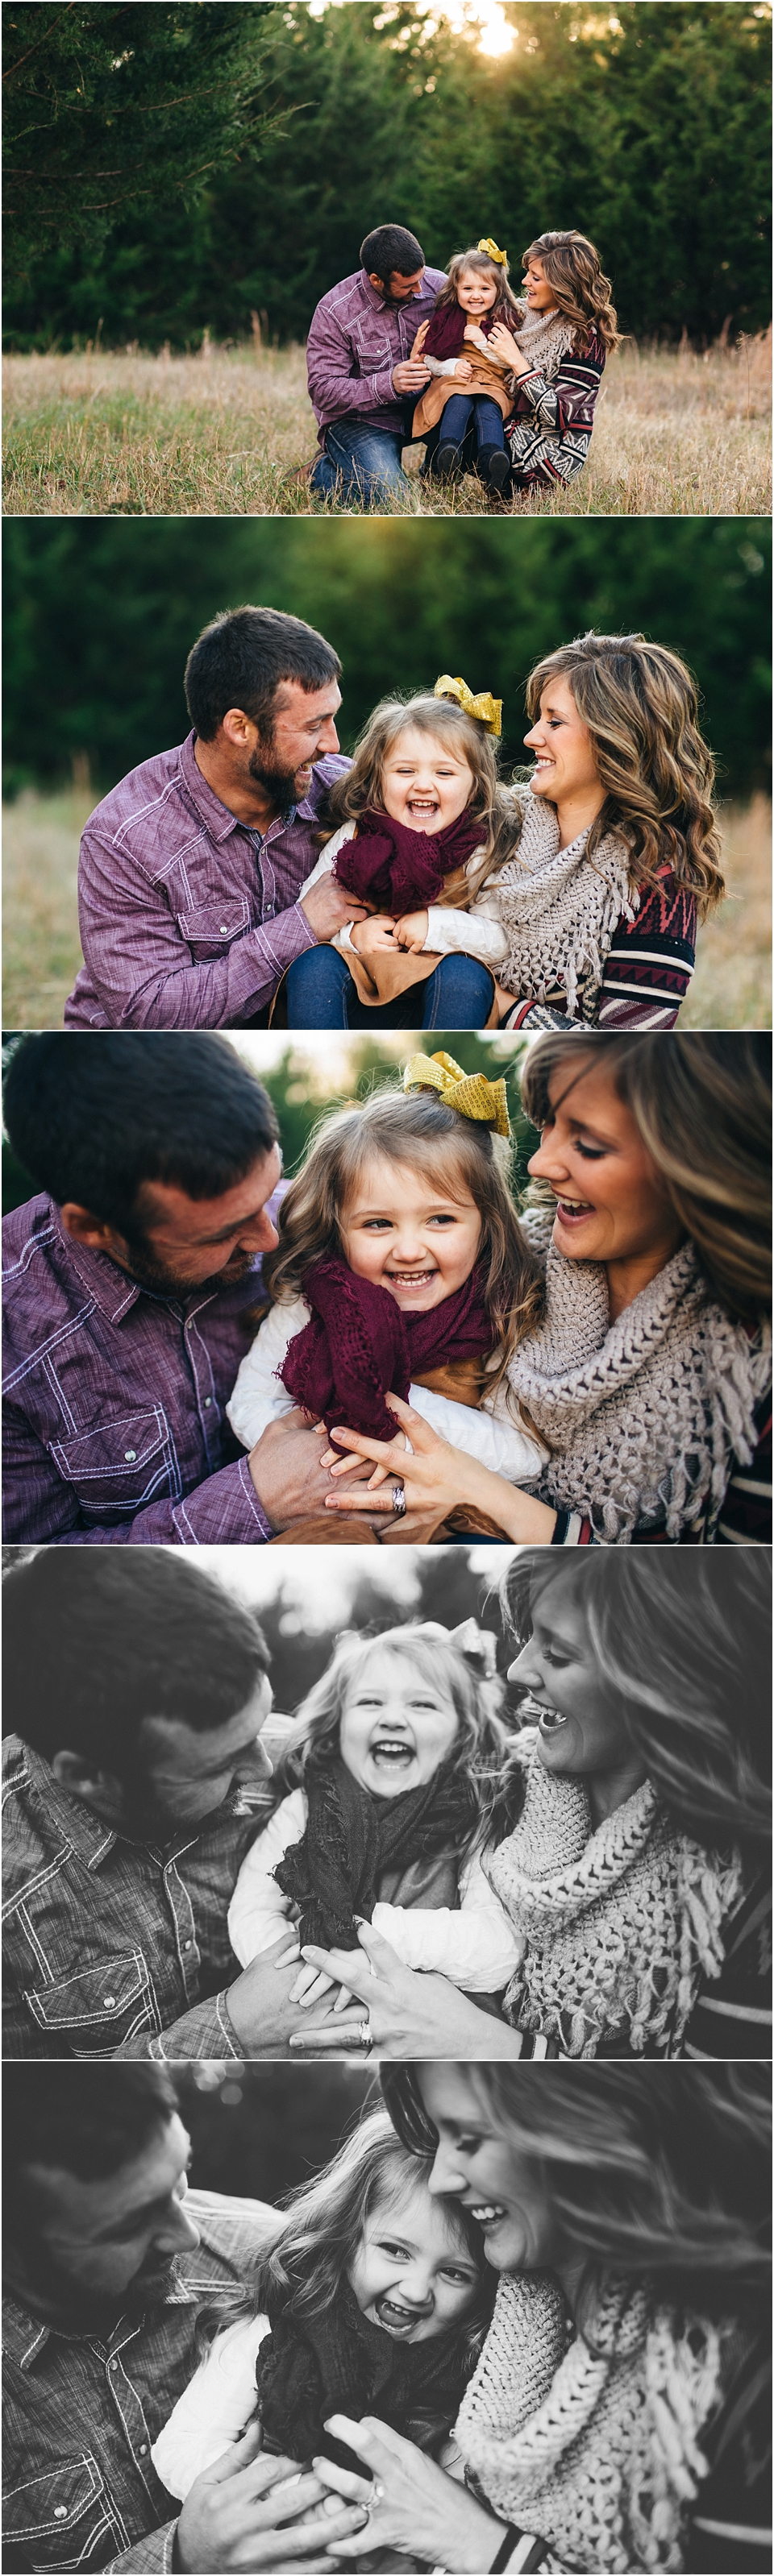 kansascityfamilyphotographer_0006